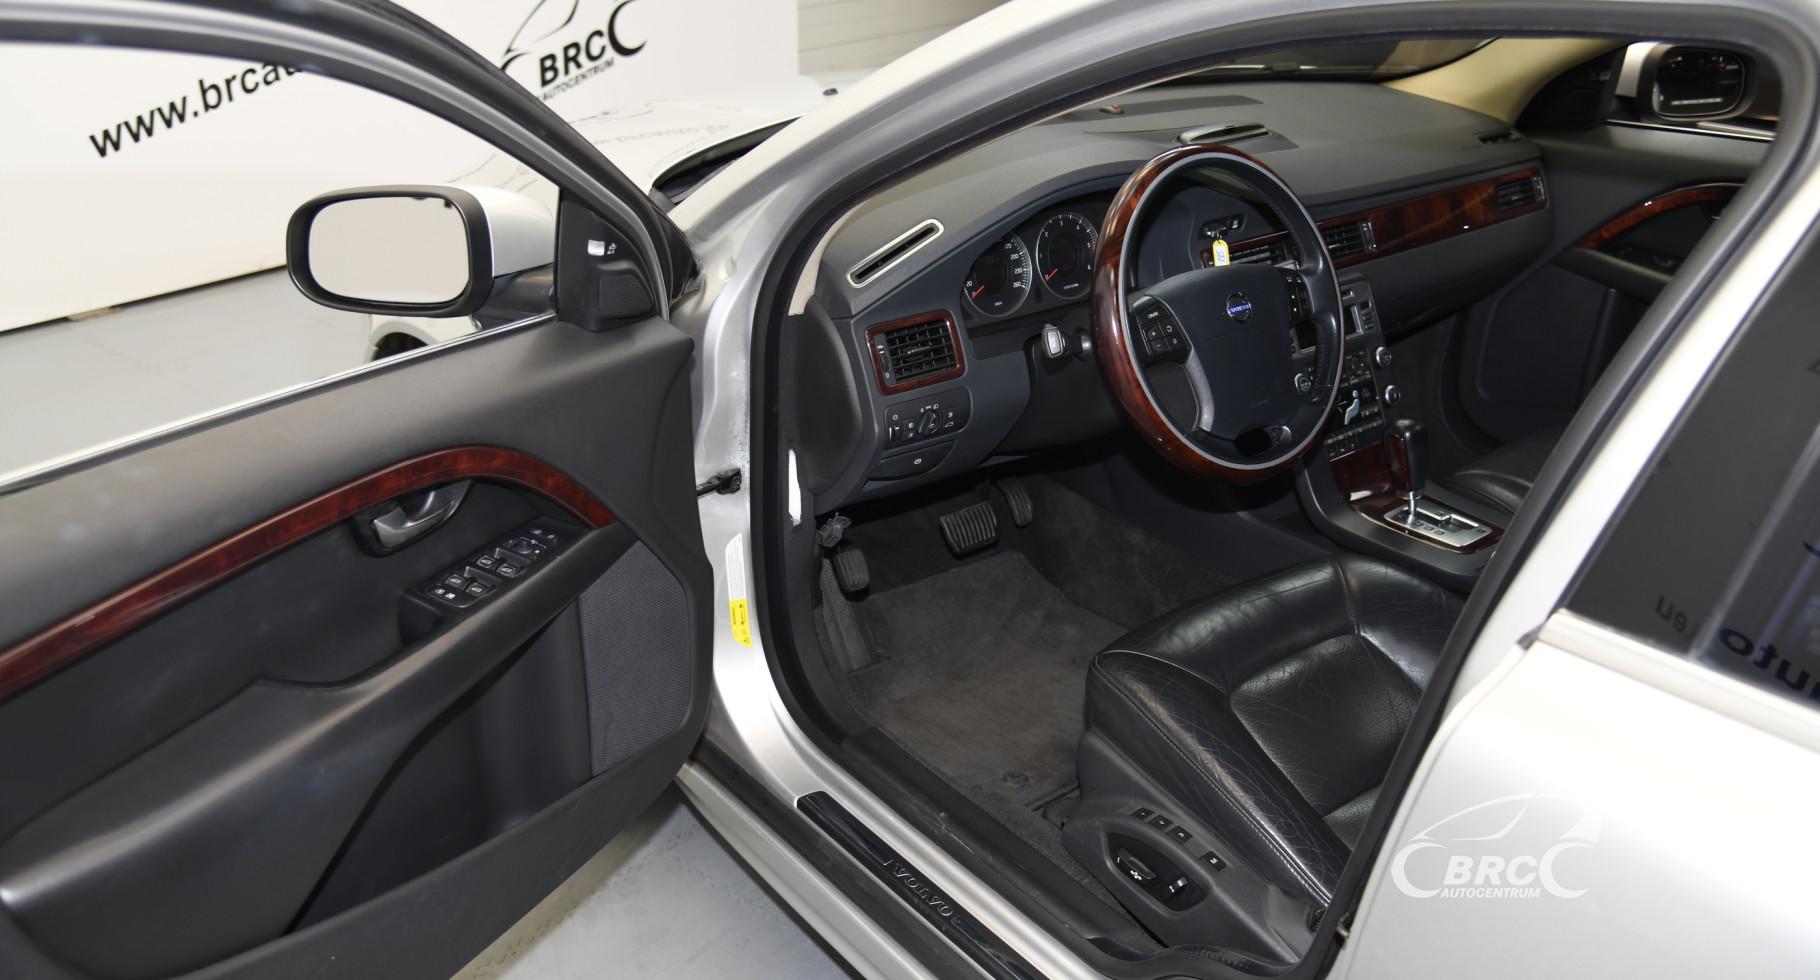 Volvo S80 2.4 D5 Automatas